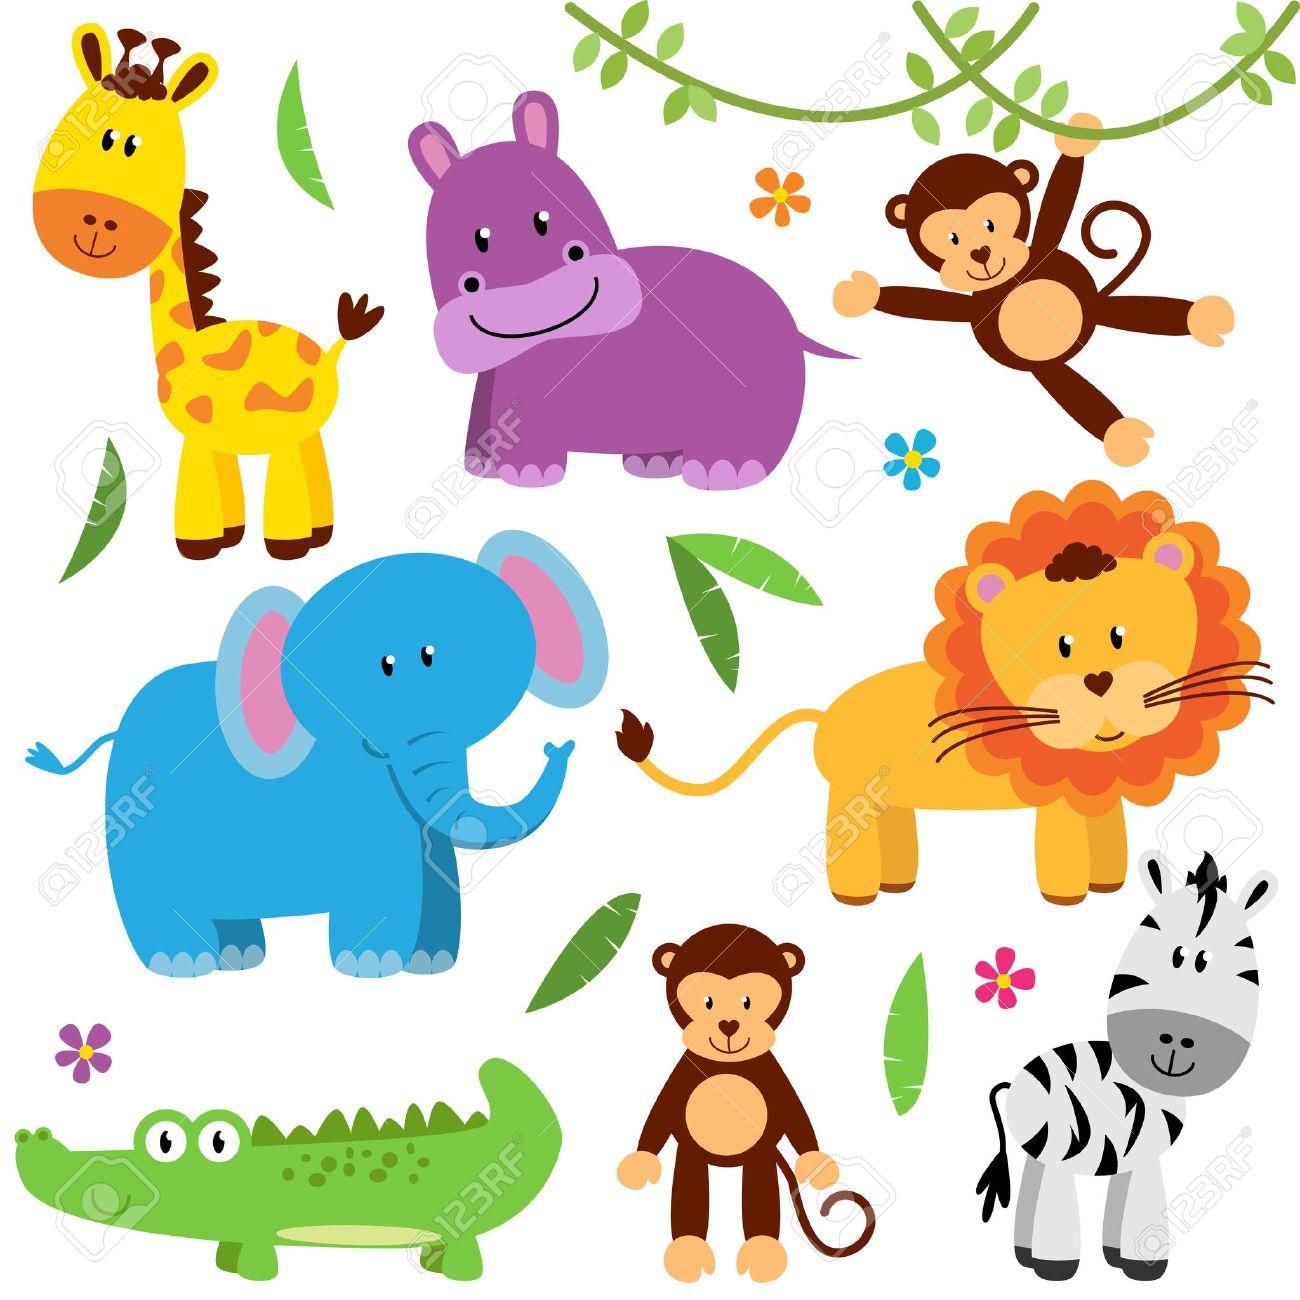 Cute Vector Set of Zoo Animals - 40603591